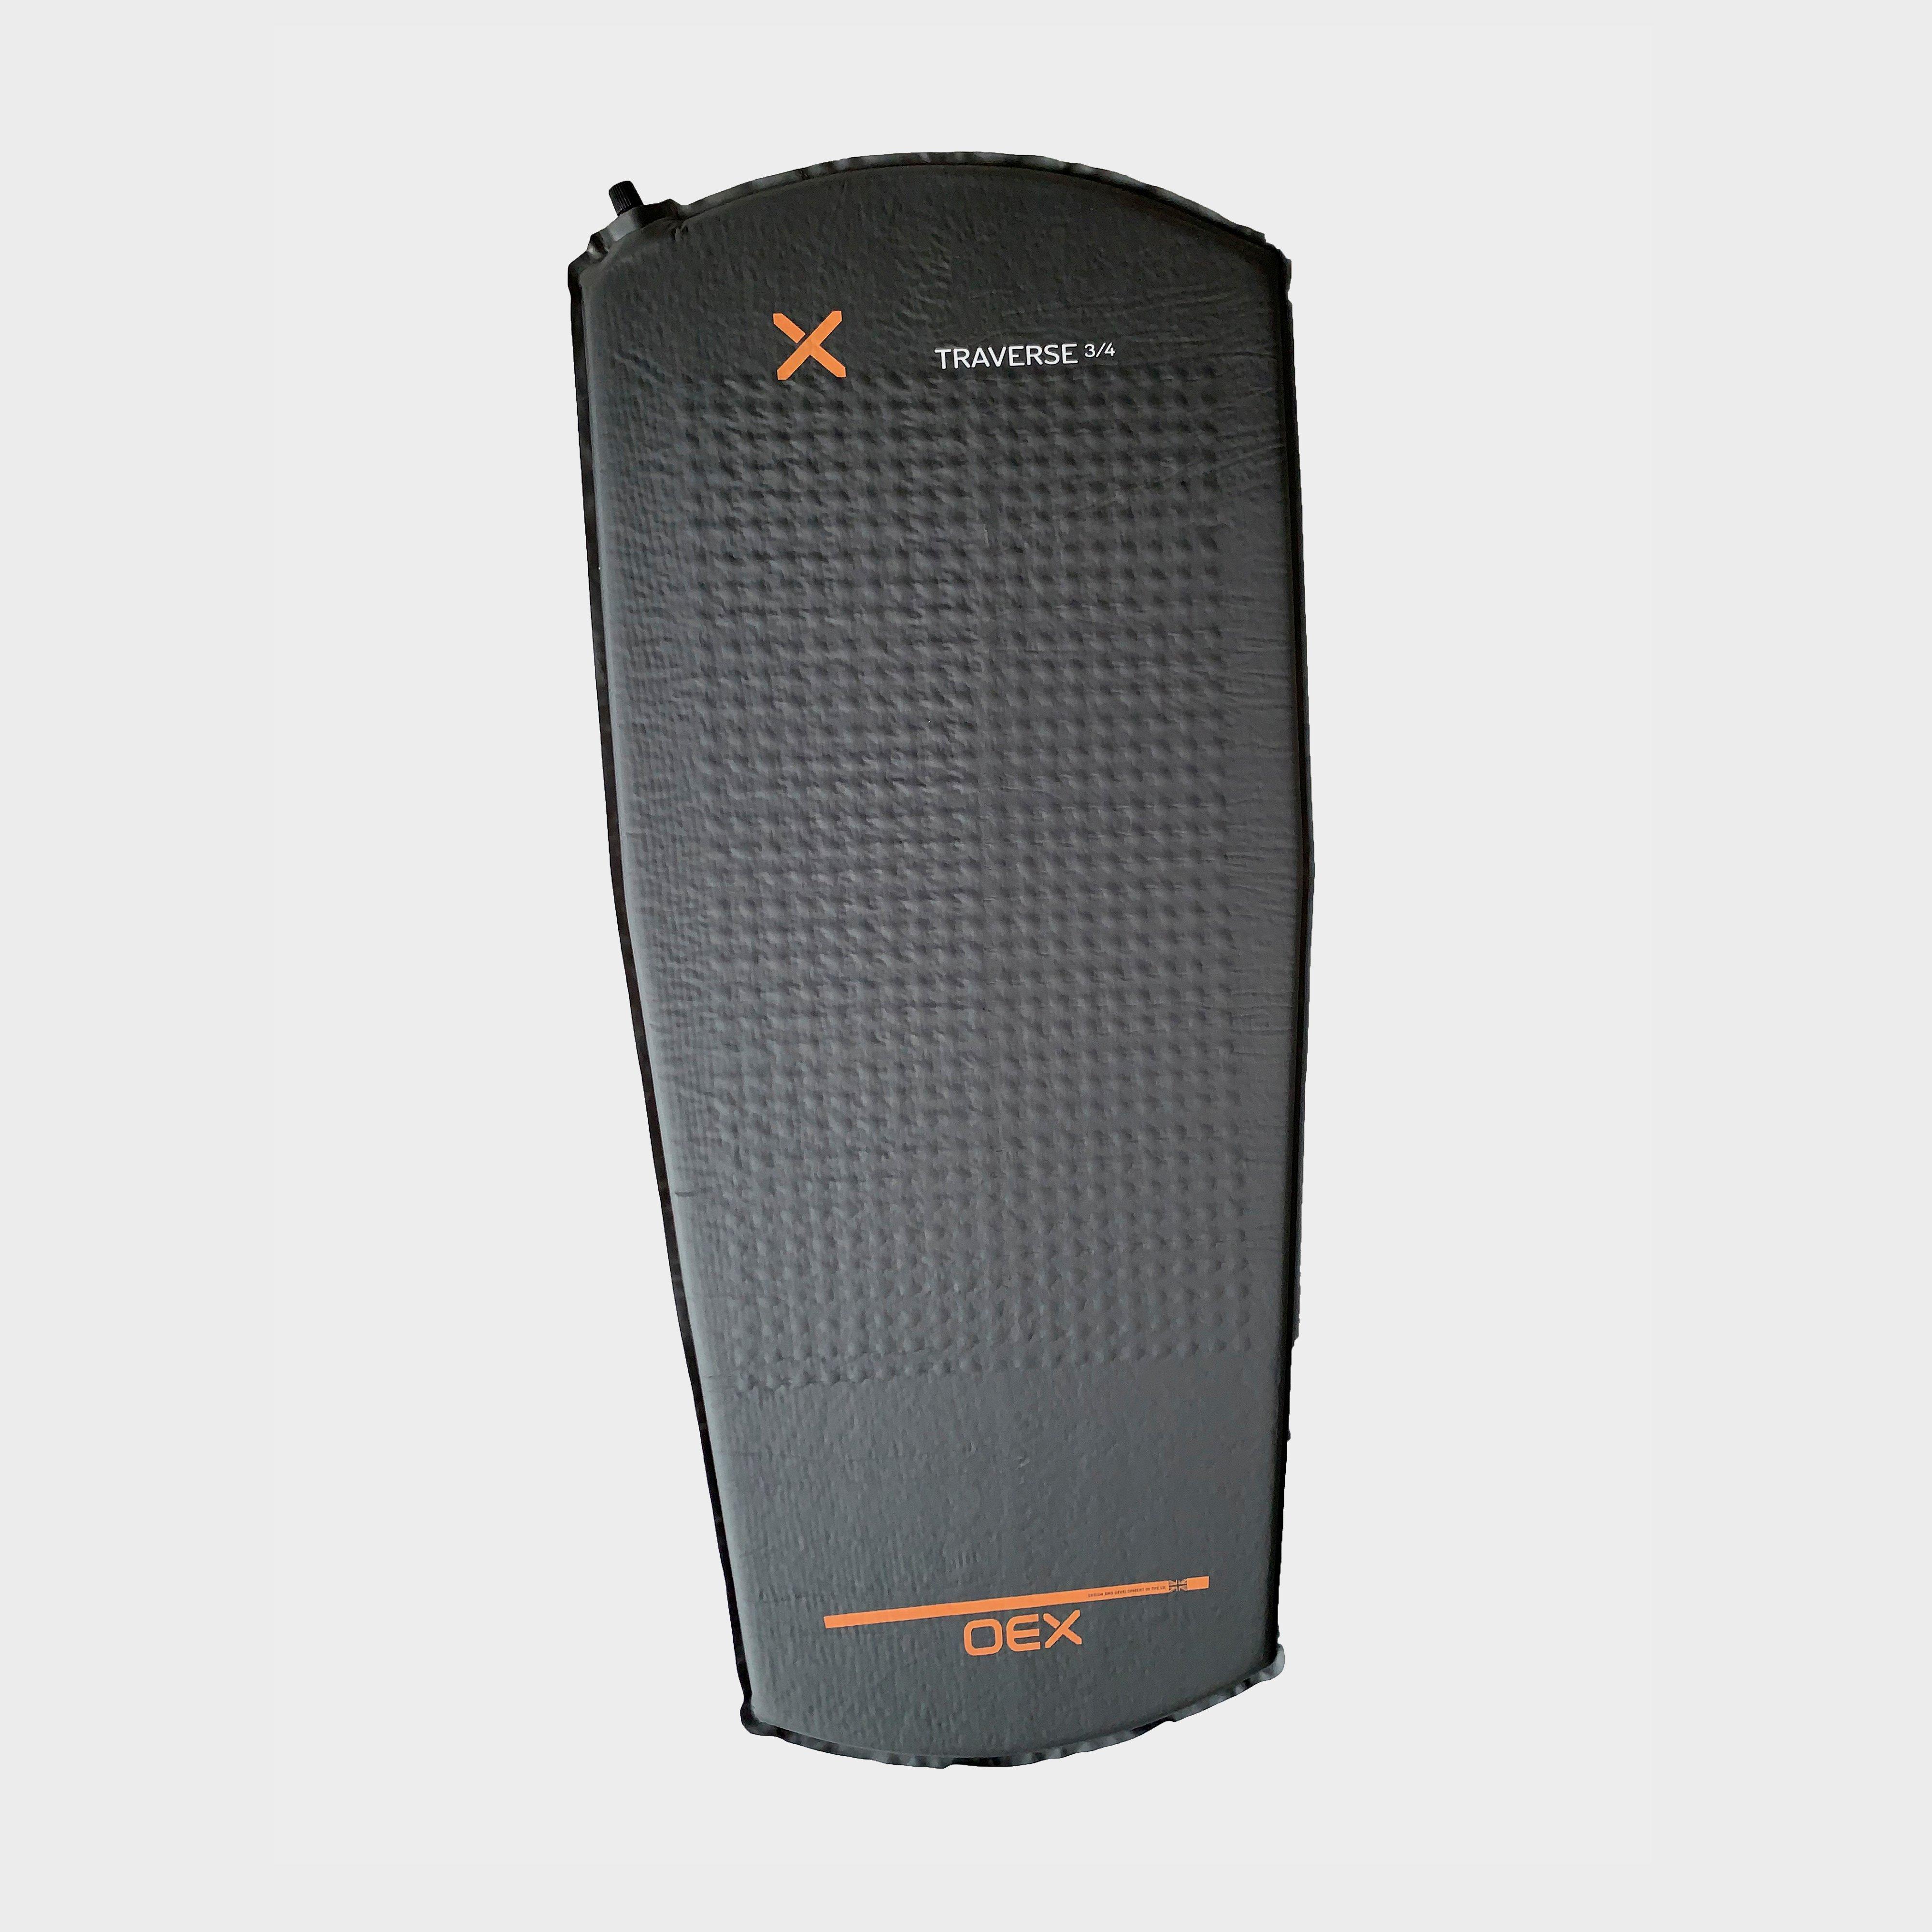 OEX Traverse 3/4 Self-Inflating Mat, CHARCOAL/SIM